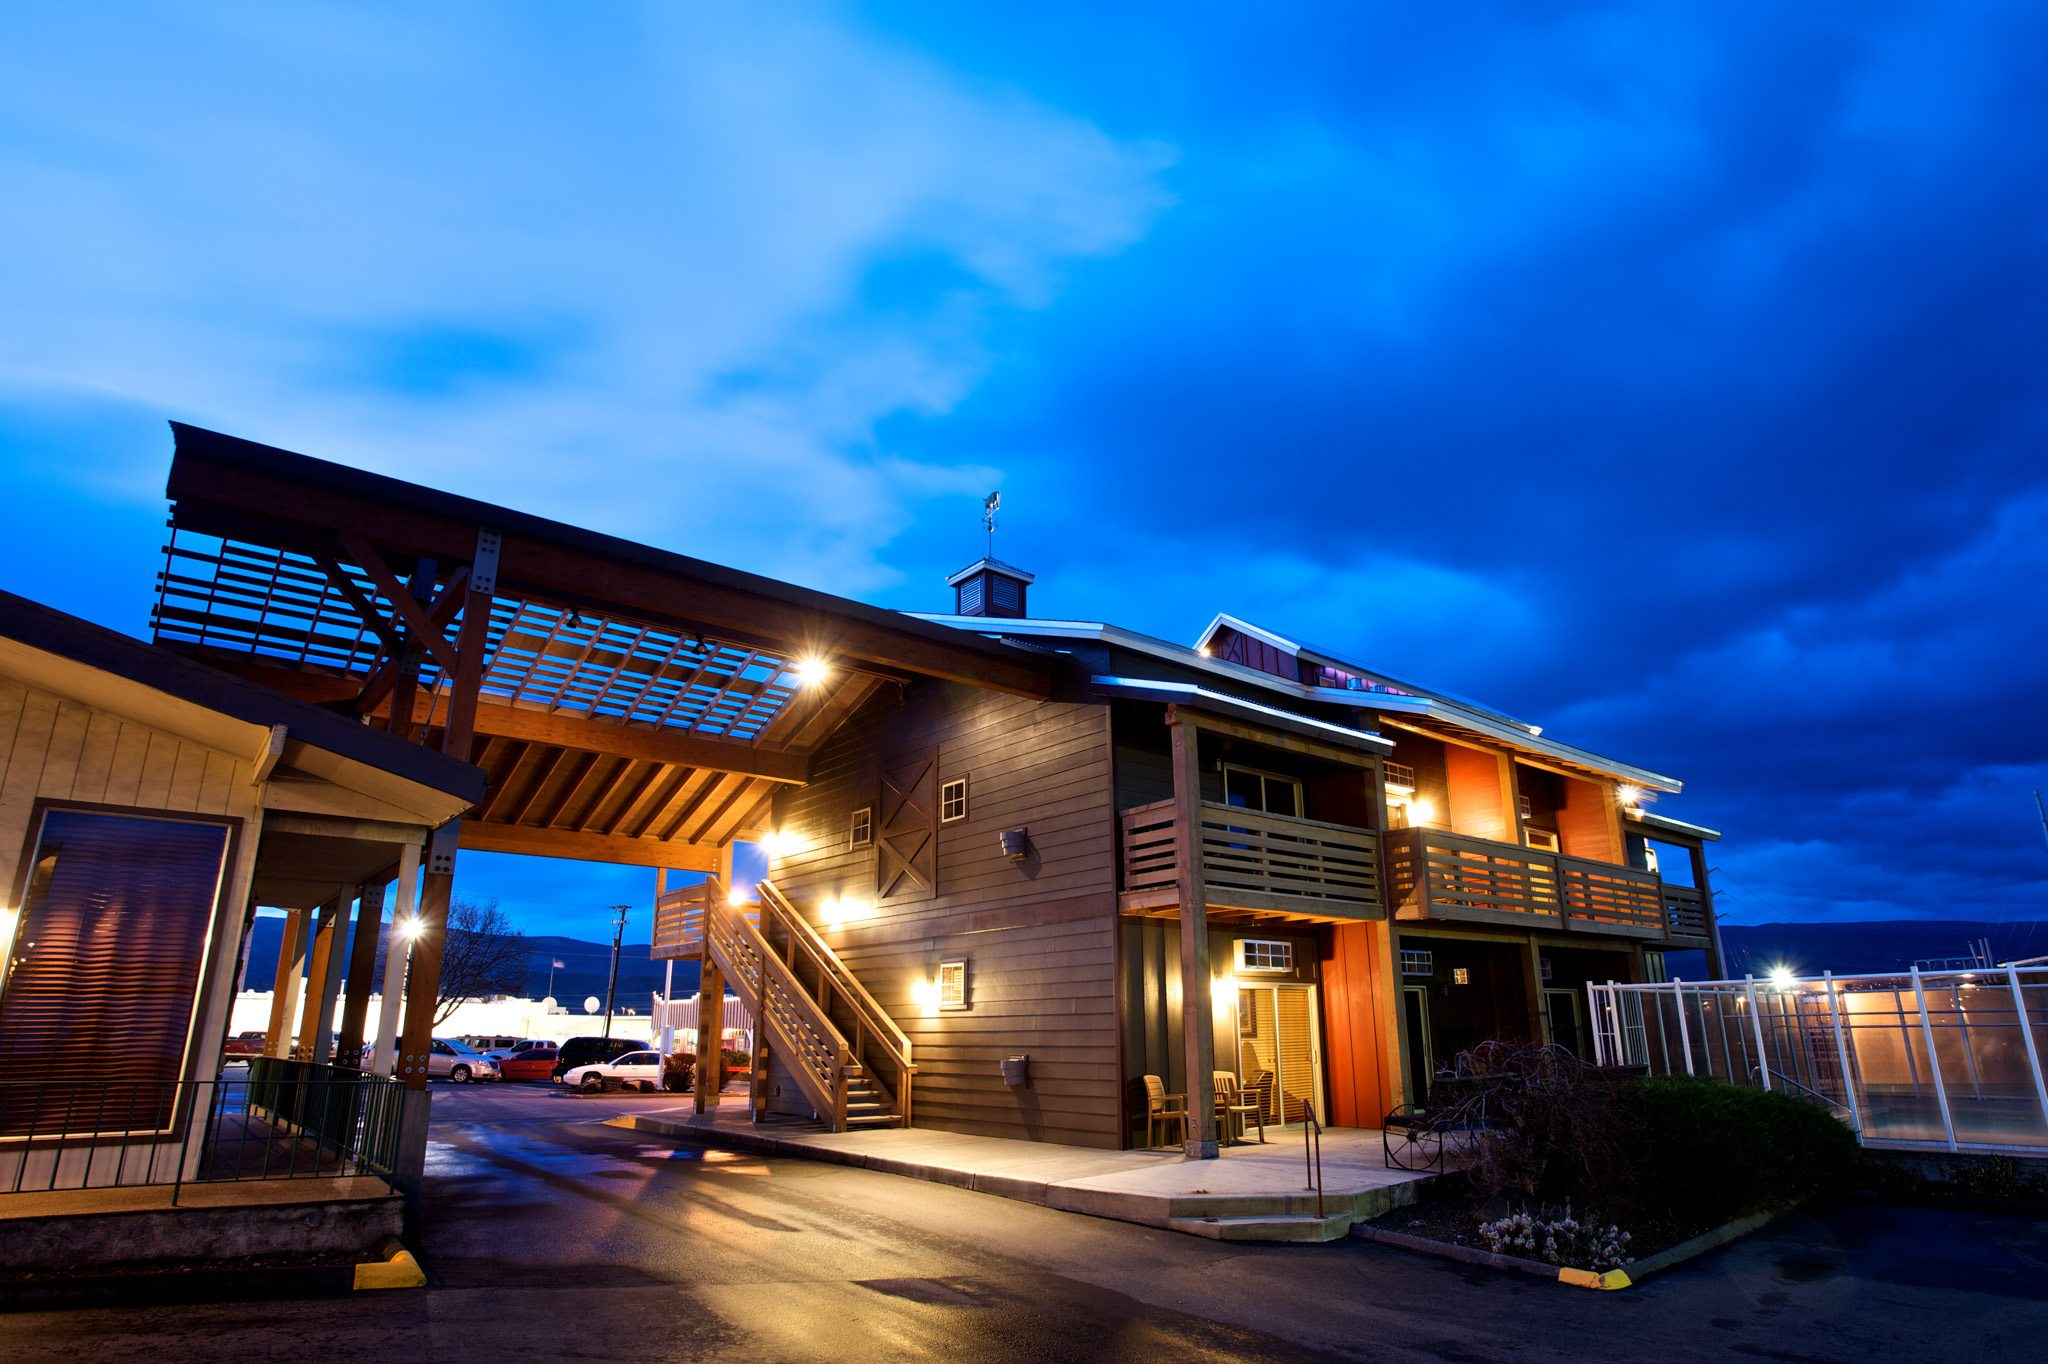 Cousins Country Inn, The Dalles, Oregon